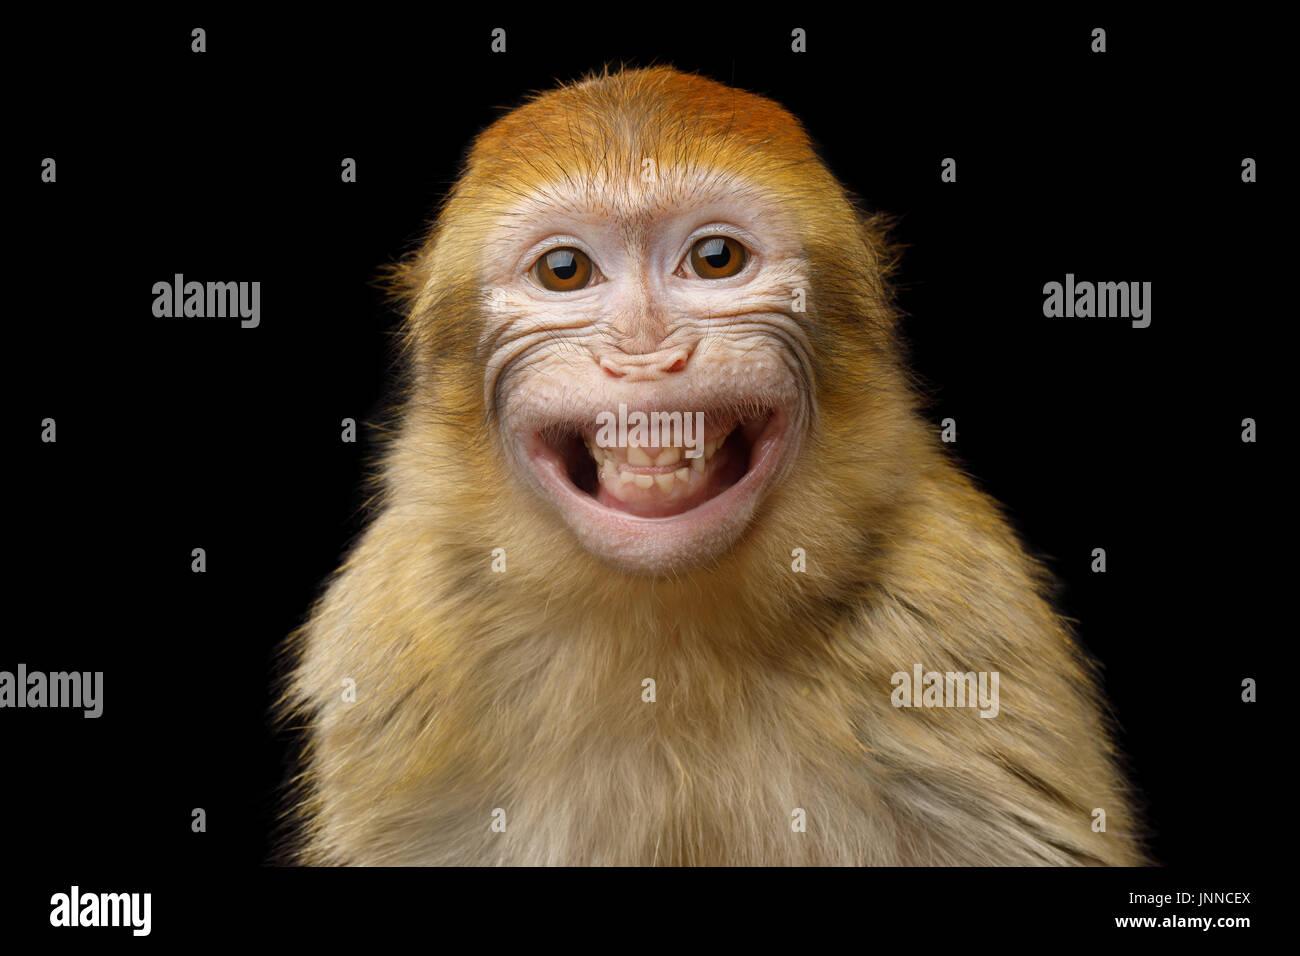 Bonobo behind the mask - 5 5